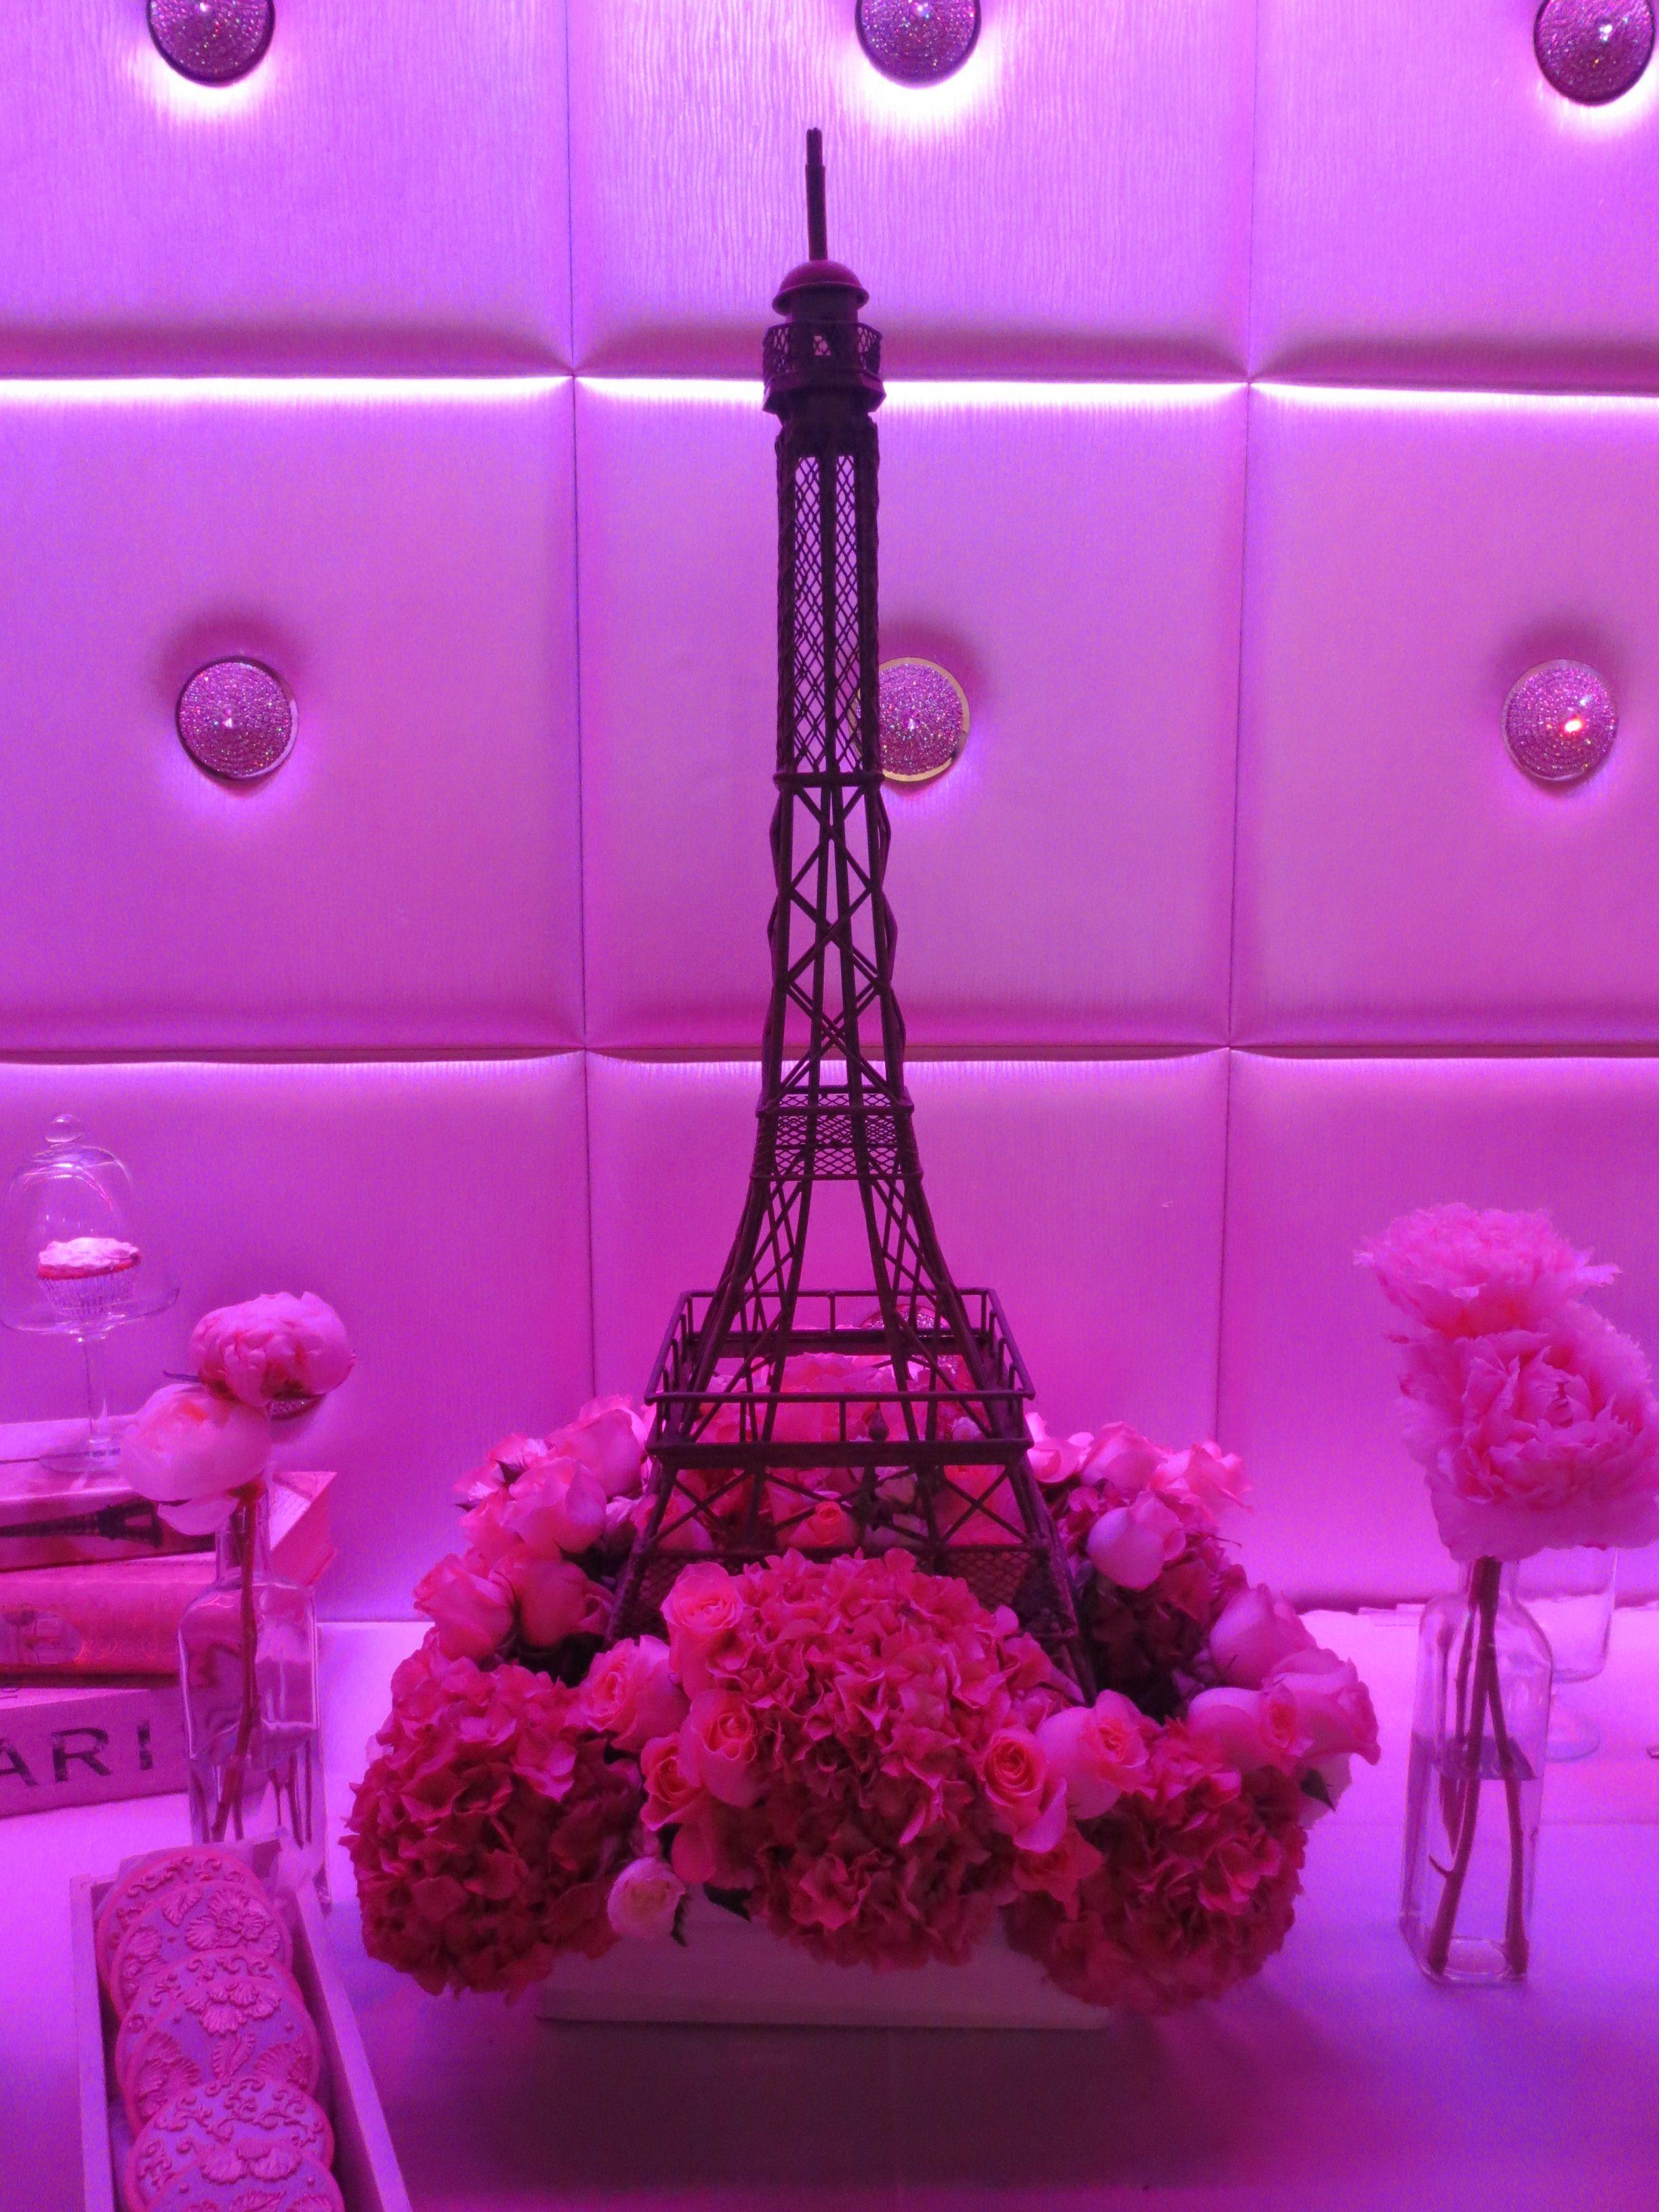 eiffel tower floral arrangement by butterfly floral design. Black Bedroom Furniture Sets. Home Design Ideas